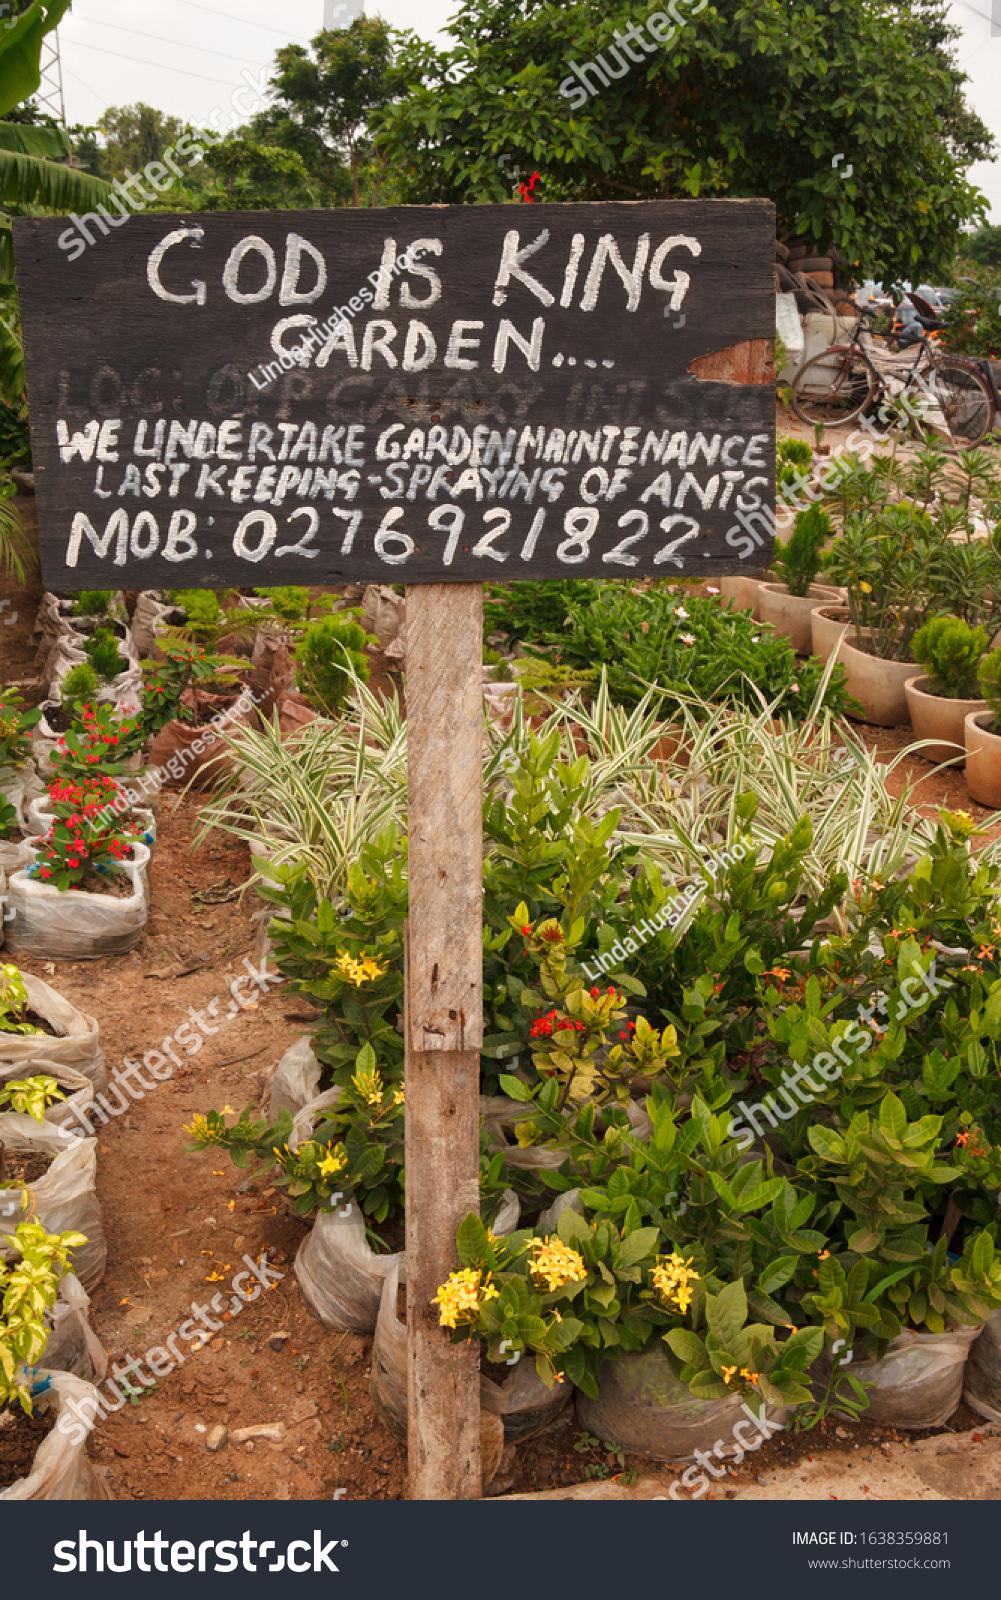 Accra Ghana Africa July 12 2012 Photo De Stock Modifier Maintenant 1638359881